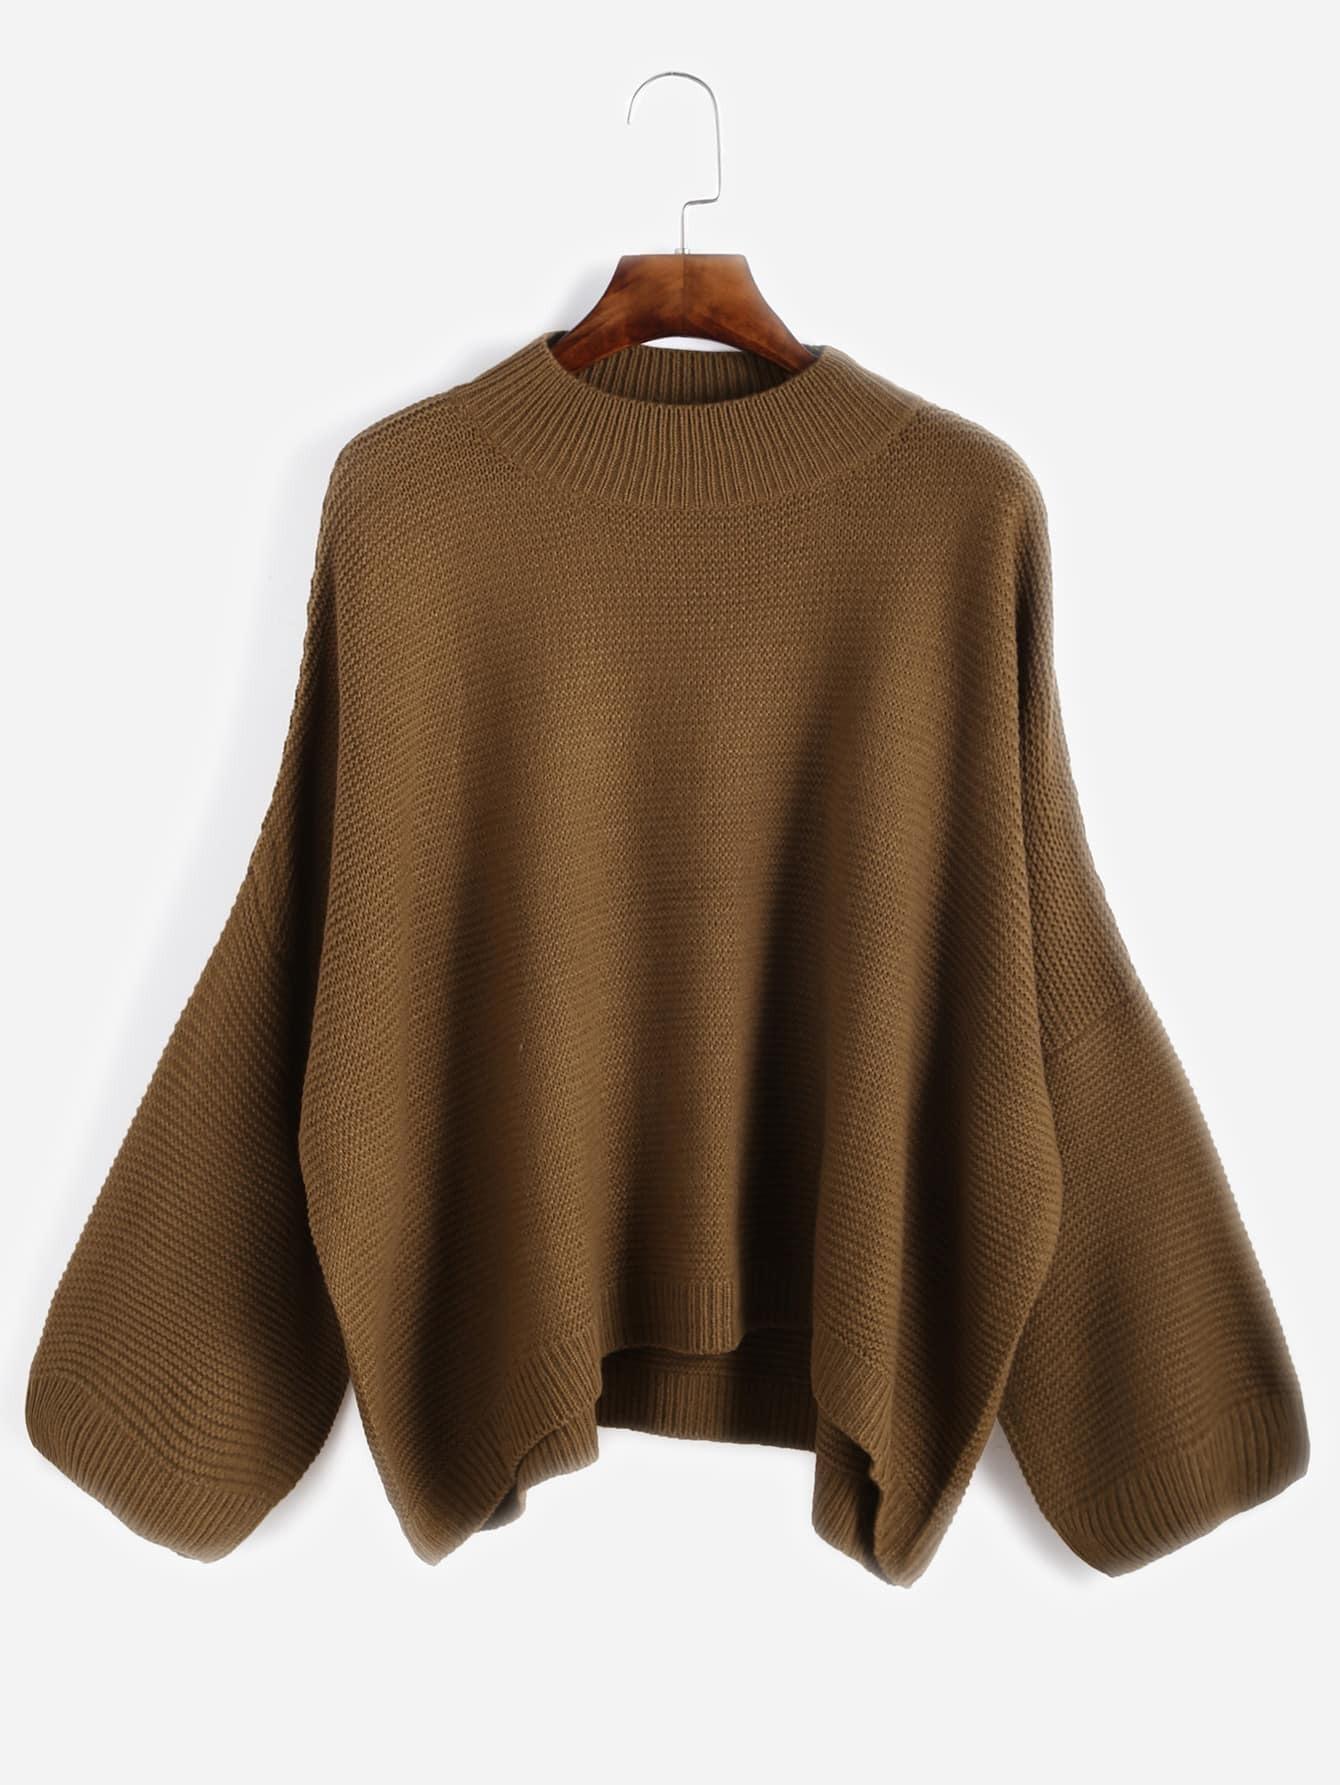 Khaki Drop Shoulder Loose Sweater sweater160929004